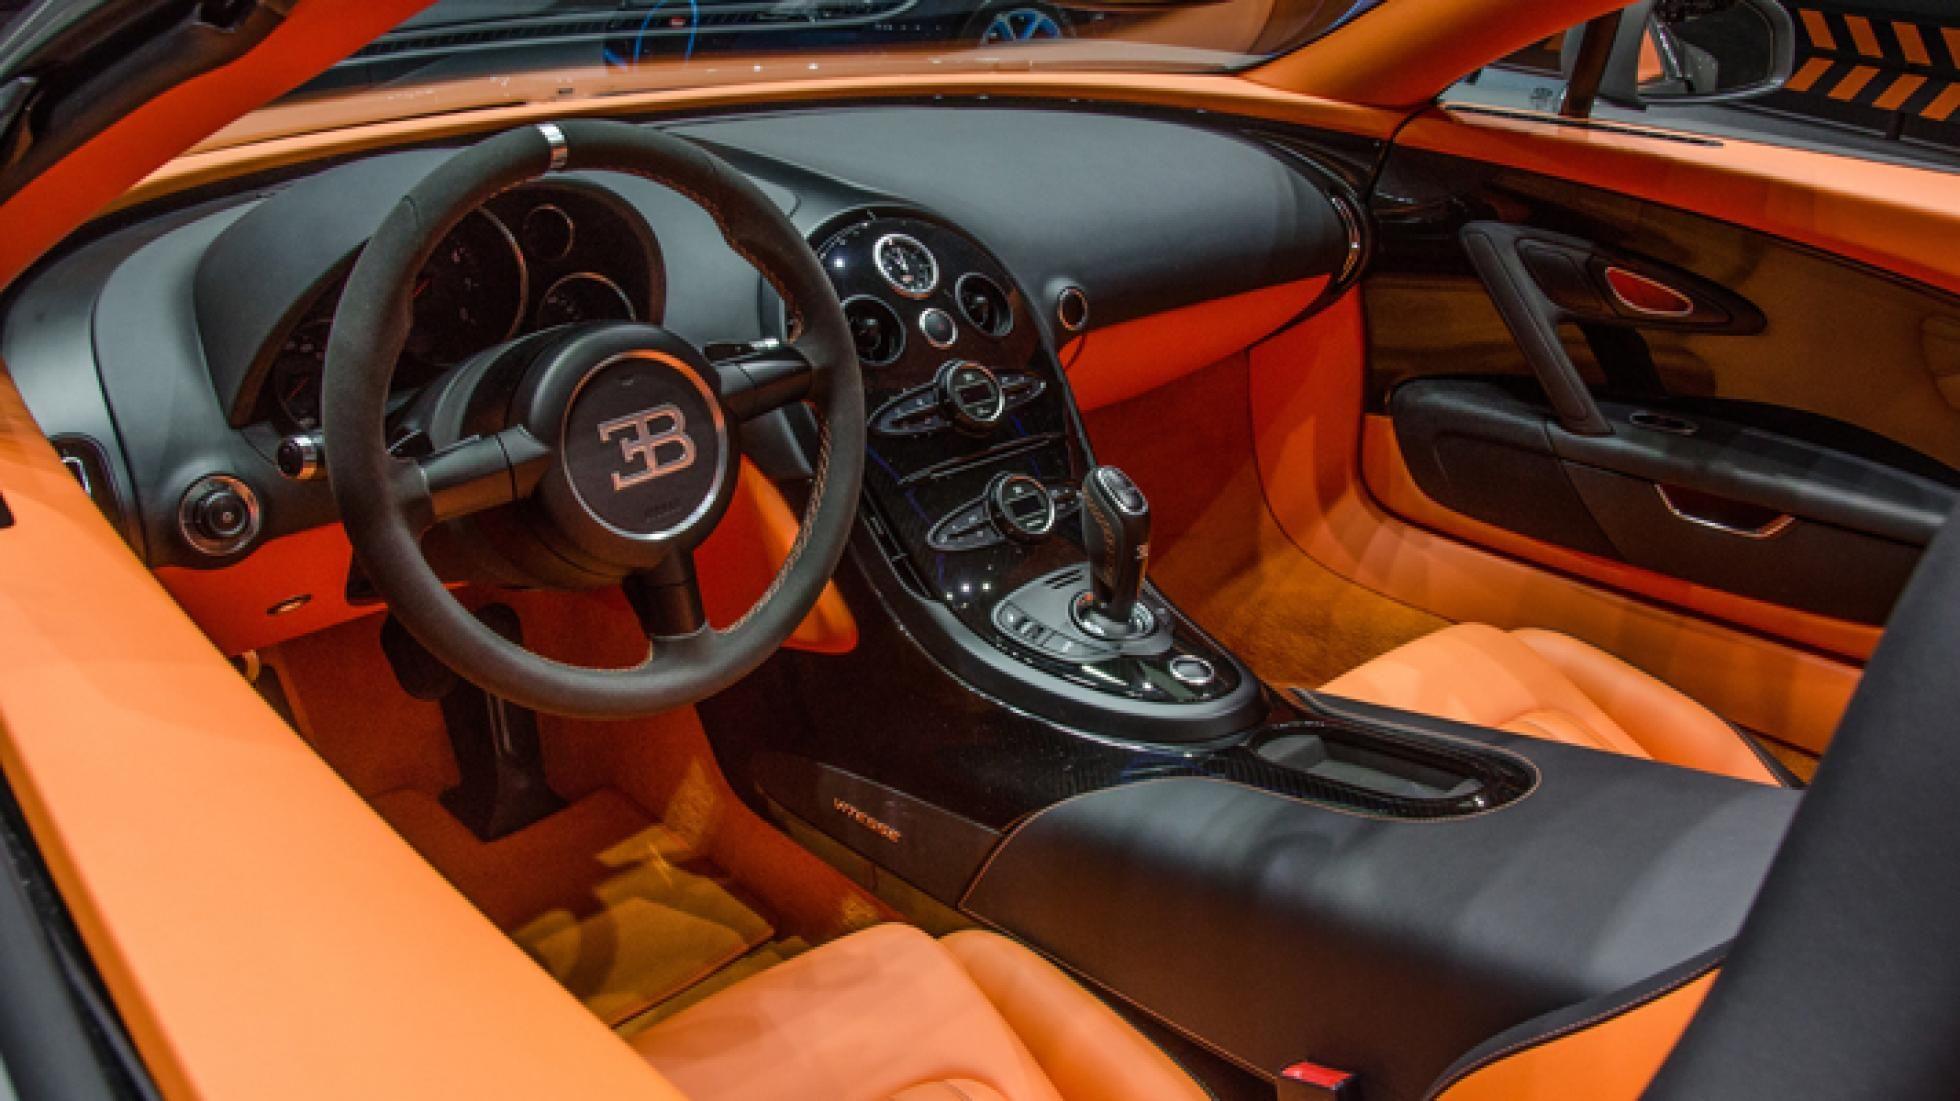 e792b5f2dcf196857492609b1f20ae71 Extraordinary Bugatti Veyron Grand Sport Vitesse Real Racing 3 Cars Trend